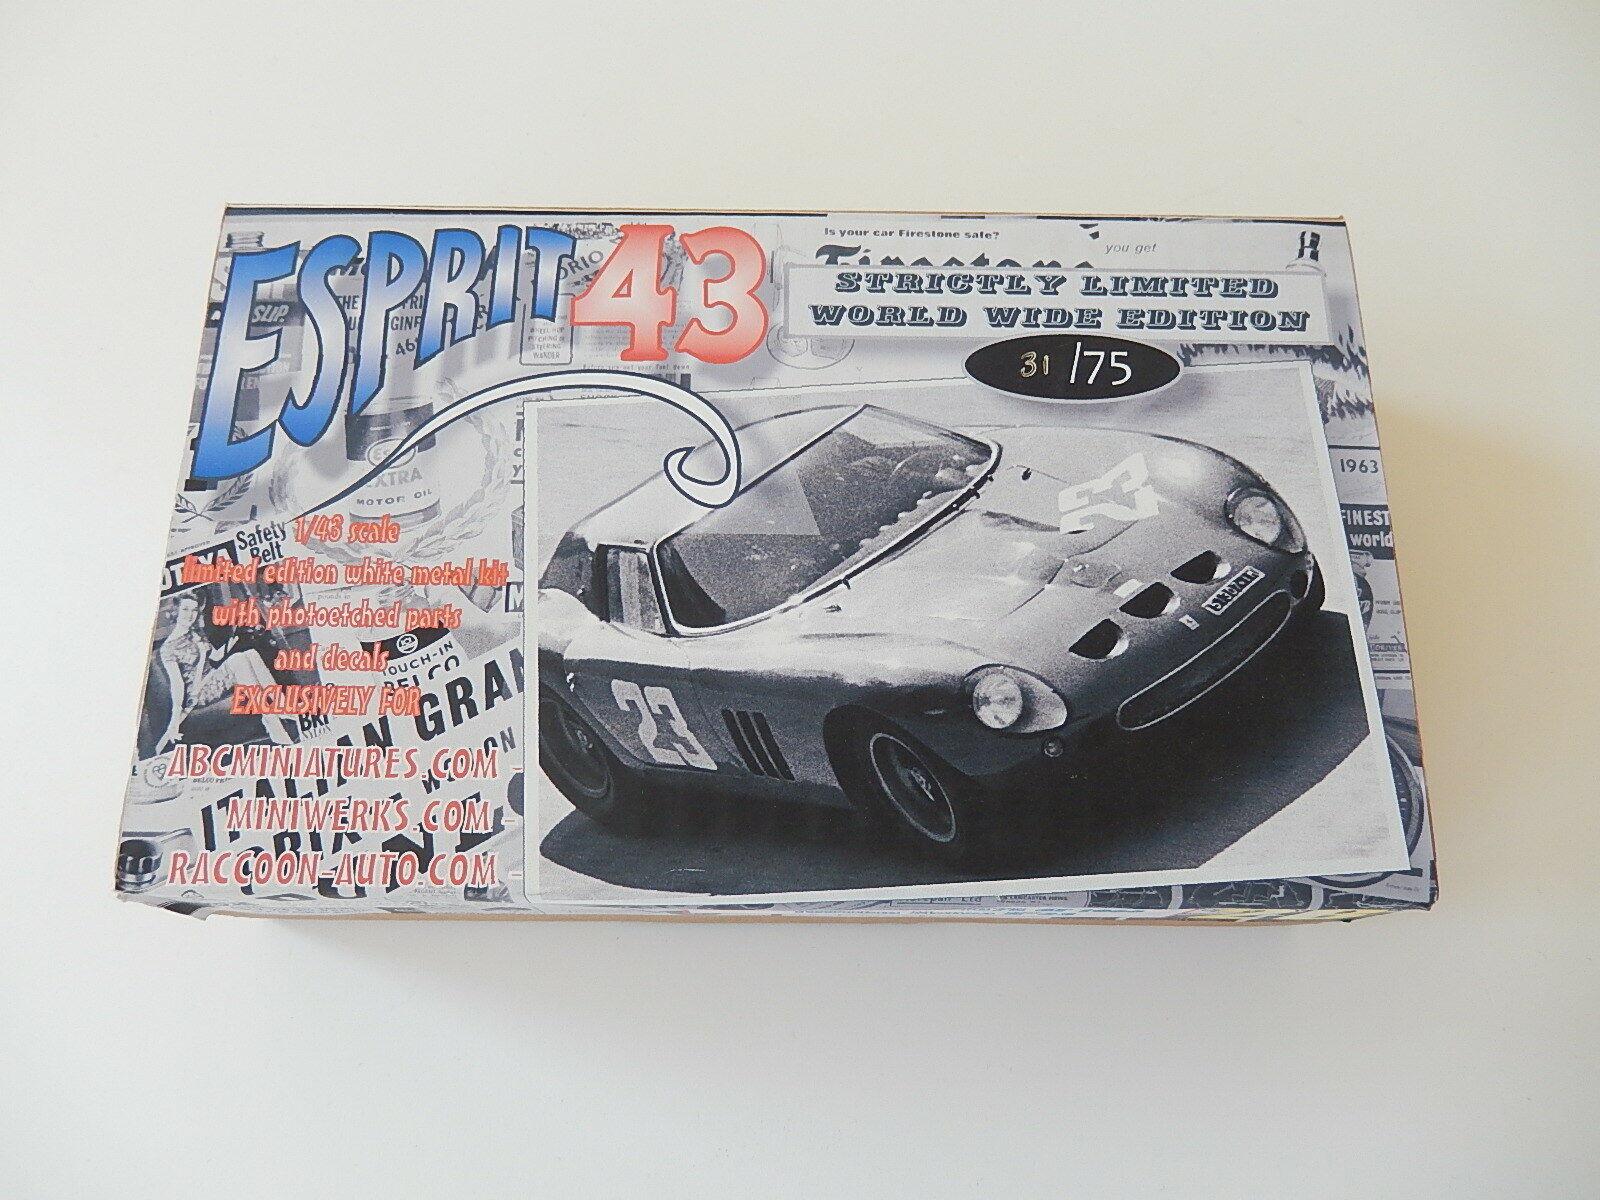 1 43 KIT METAL Ferrari 250 GTO 64 Targa florio 1966 special nose    amr  bbr